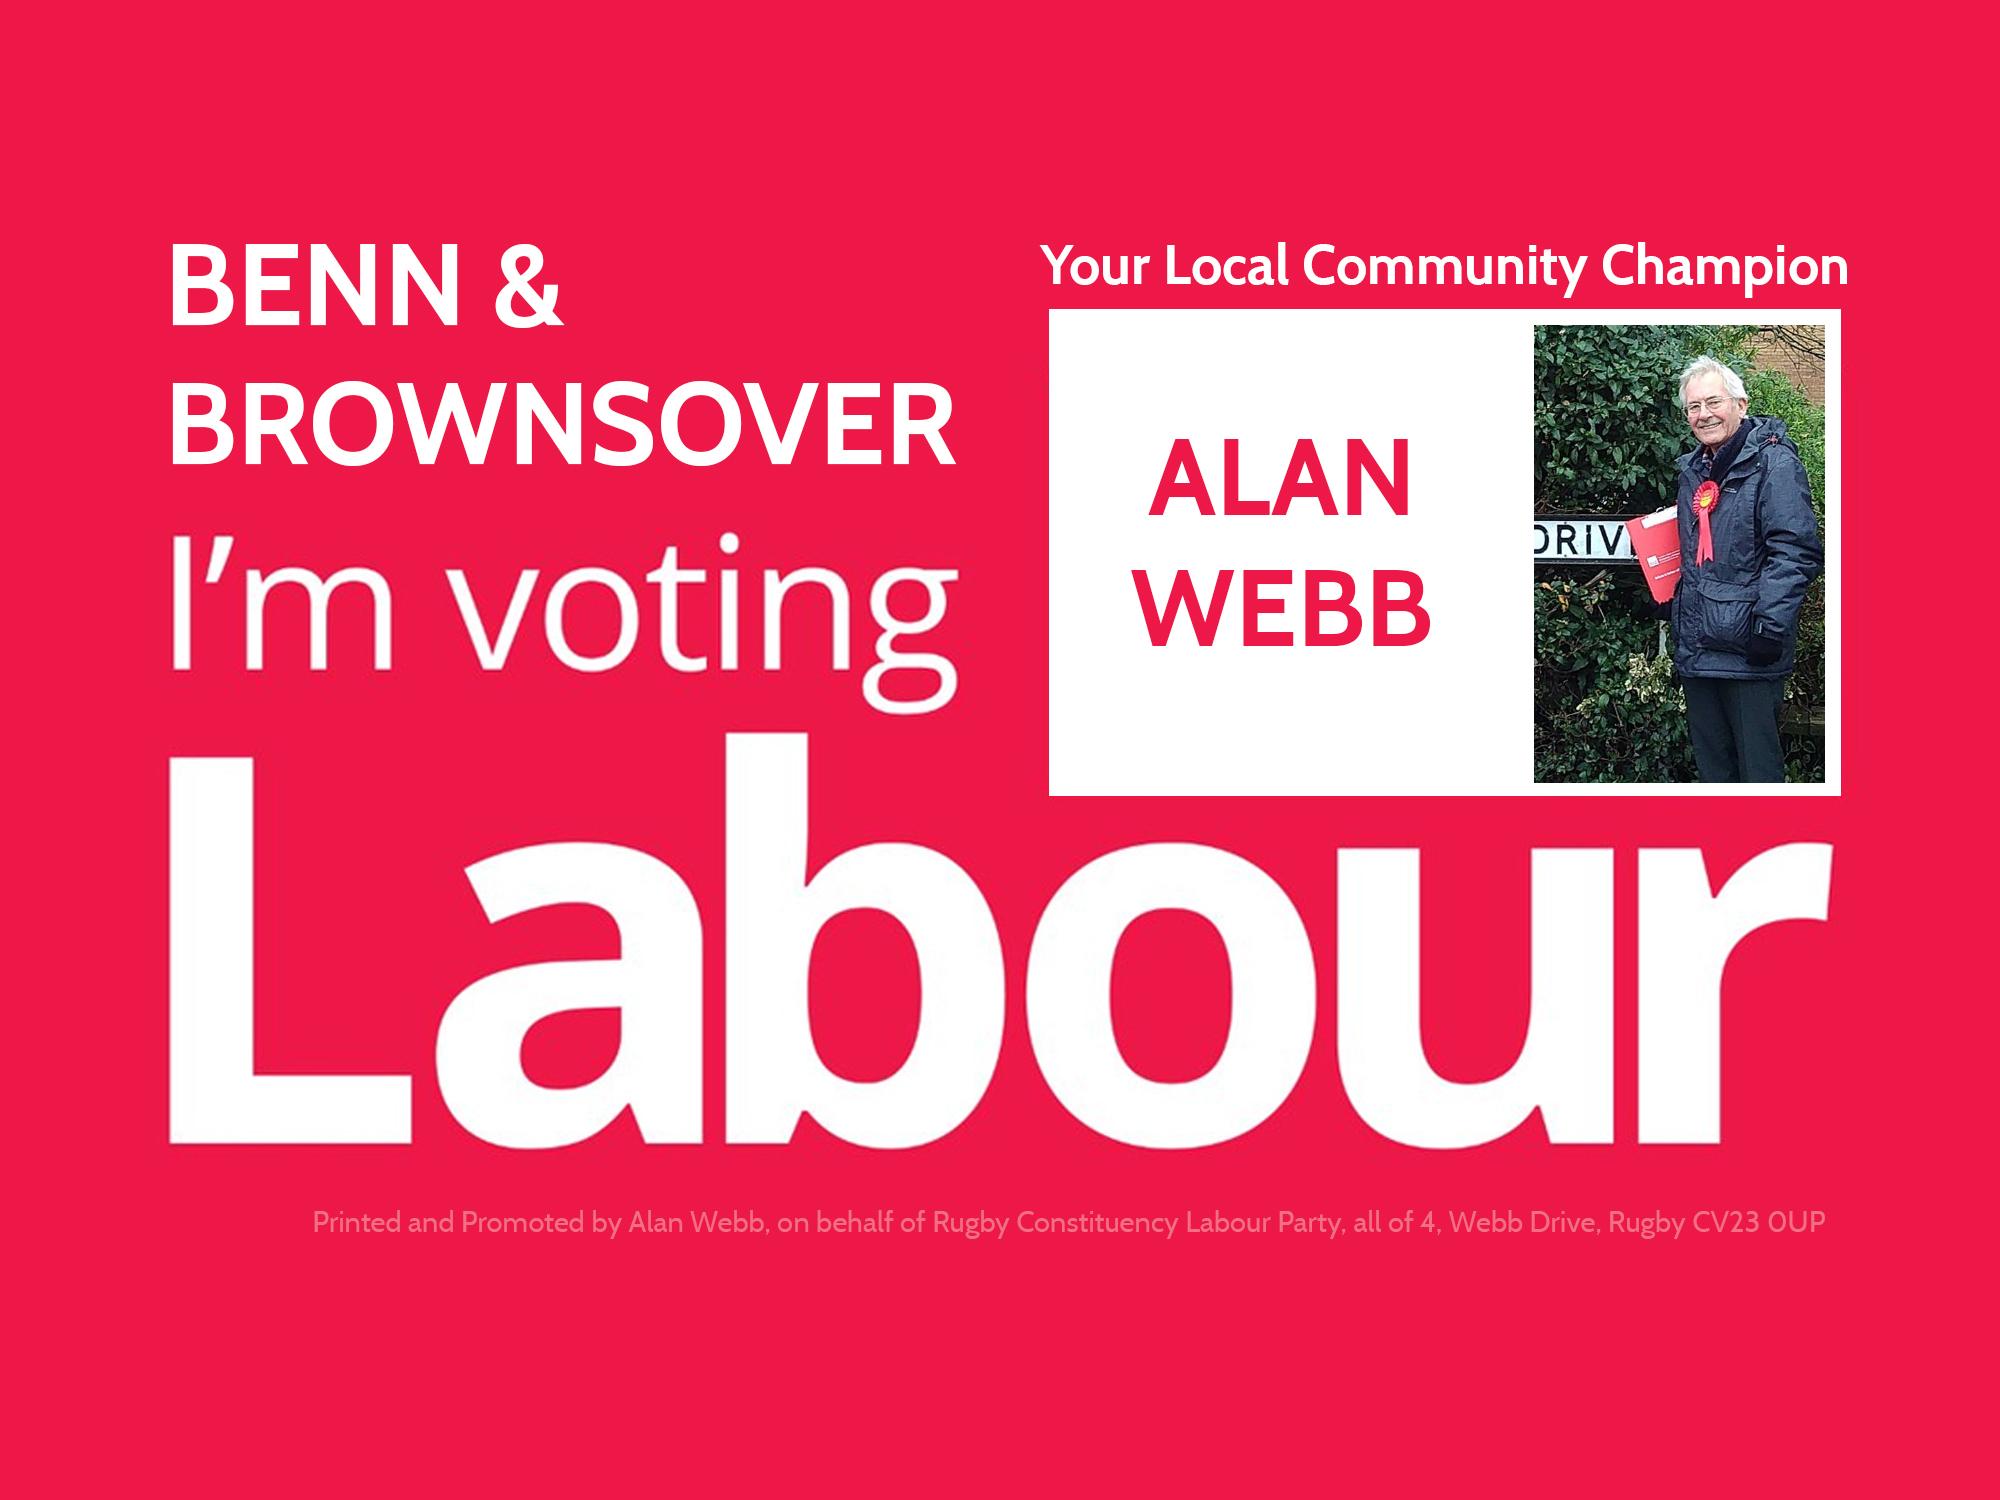 Alan_webb_Benn_brownsover.jpg